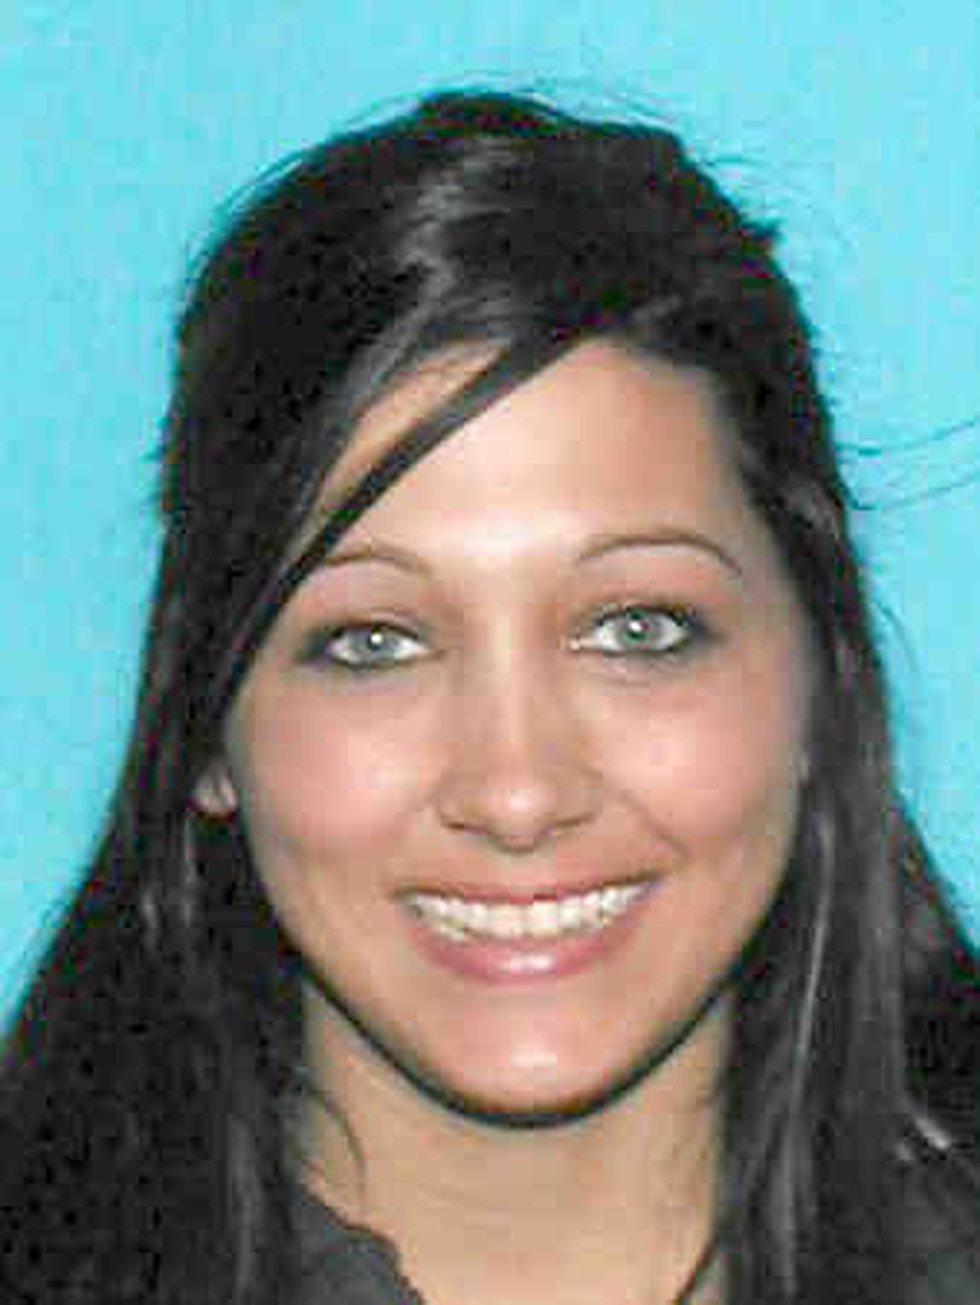 Kristyn Hoffpauir (Source: Vernon Parish Sheriff's Office)